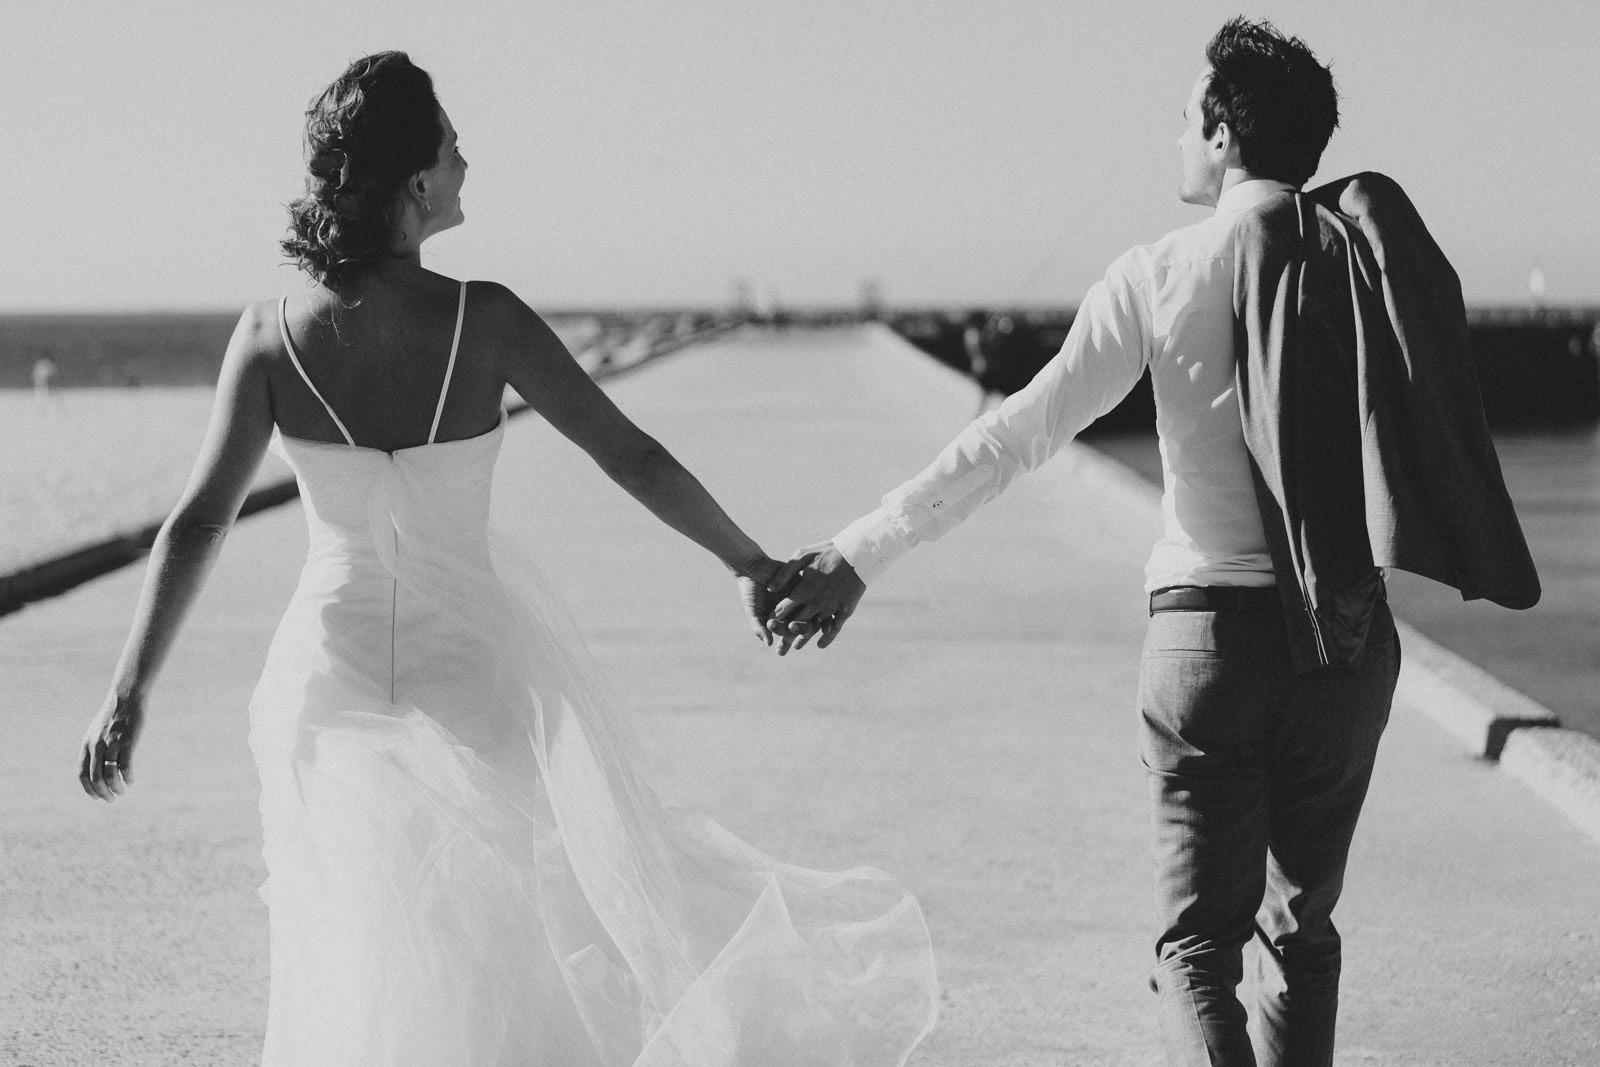 Evabloem_trouwen-sint-joris-doele_strandpaviljoen-zuid-54.jpg